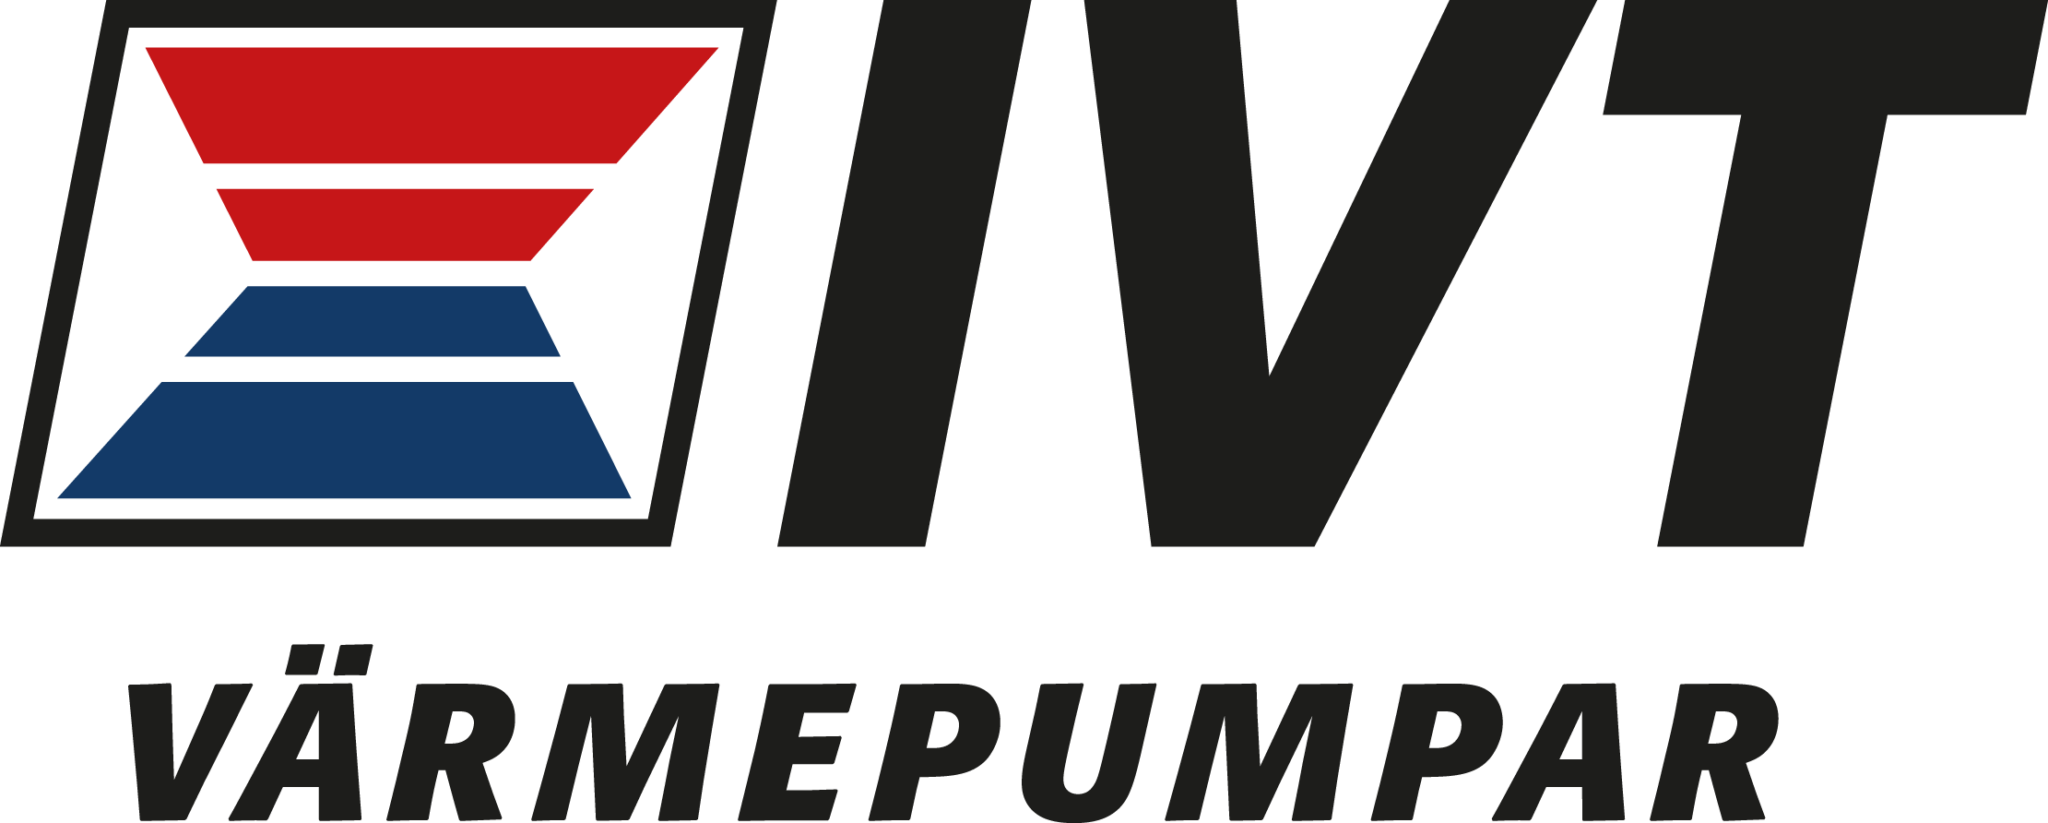 IVT logotype